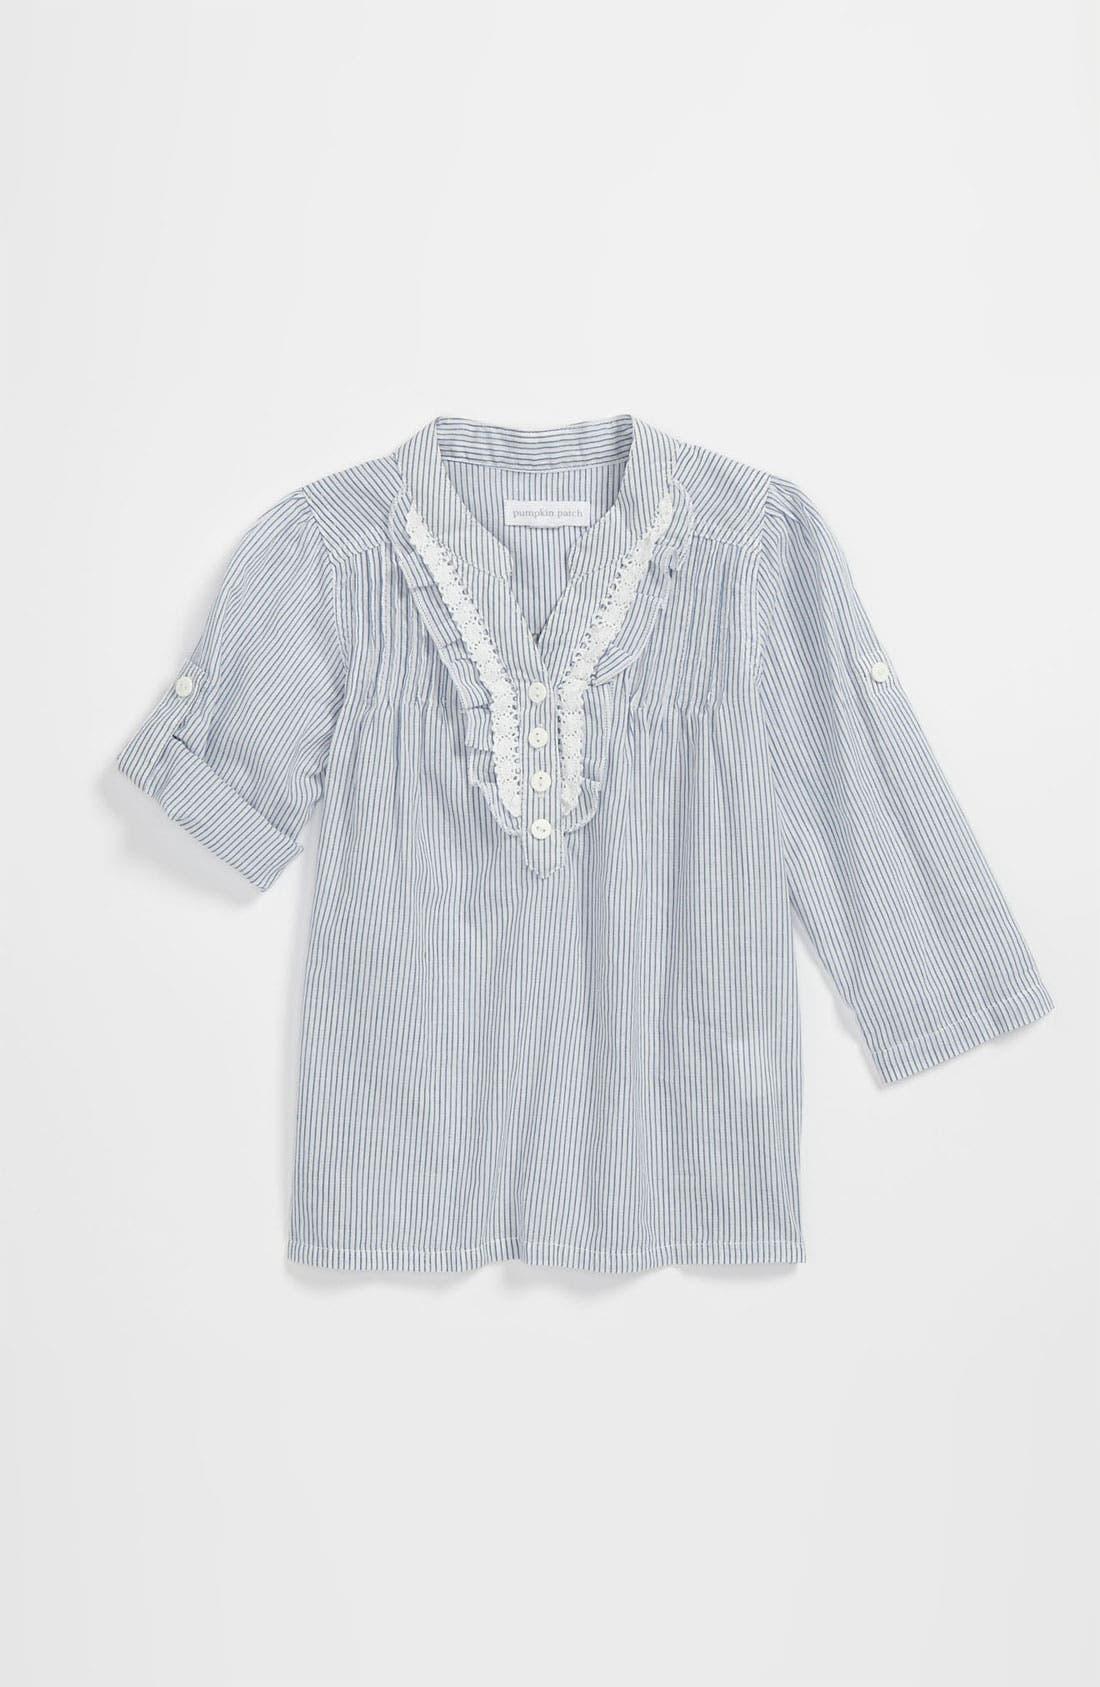 Alternate Image 1 Selected - Pumpkin Patch Stripe Ruffle Shirt (Toddler)